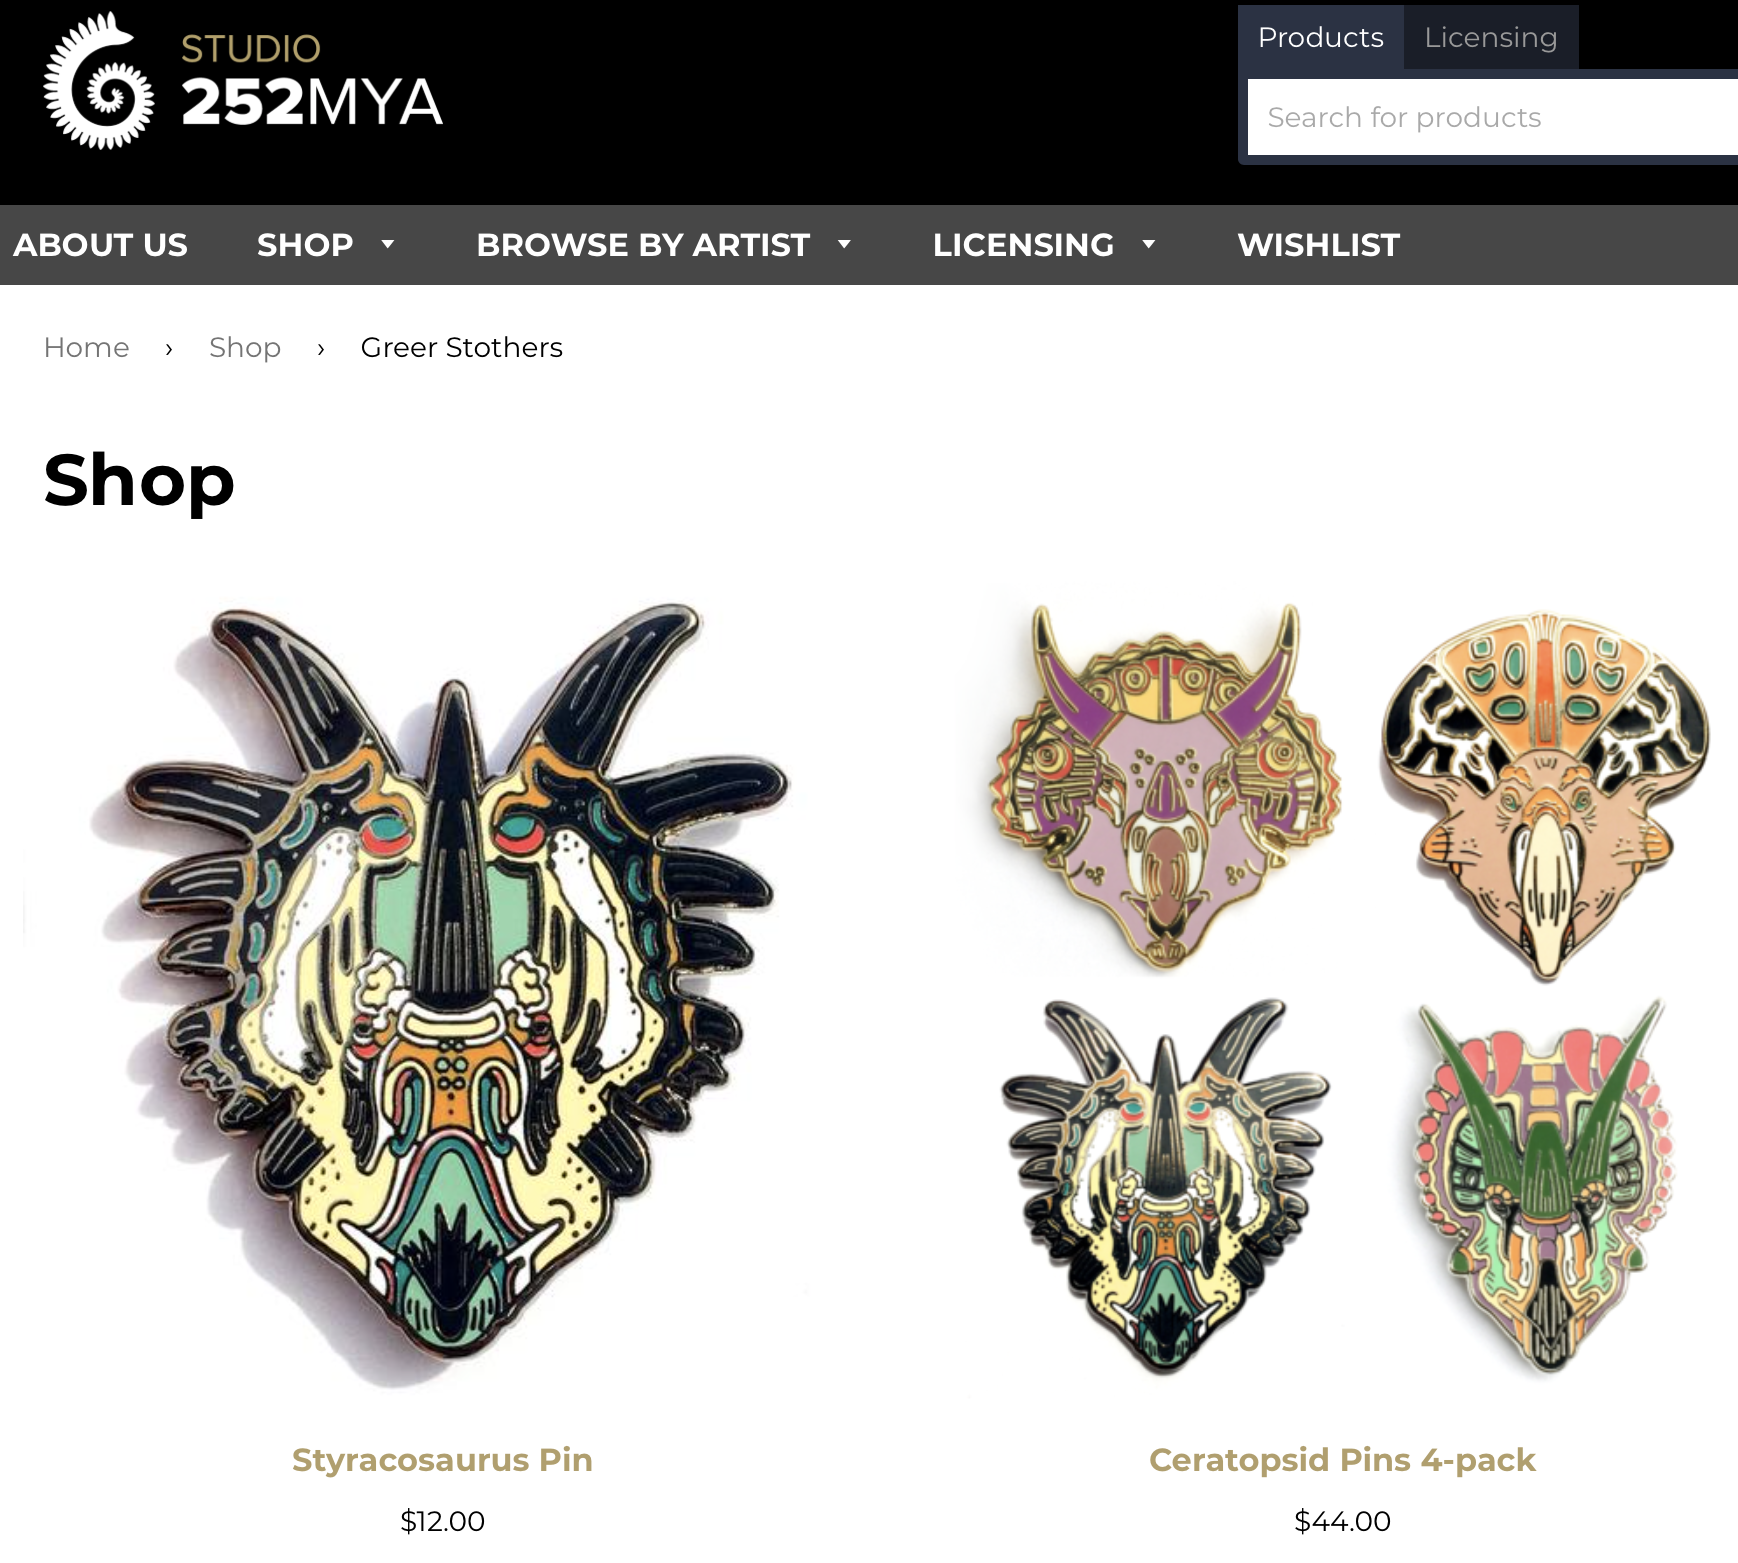 A screenshot of my work on 252mya.com